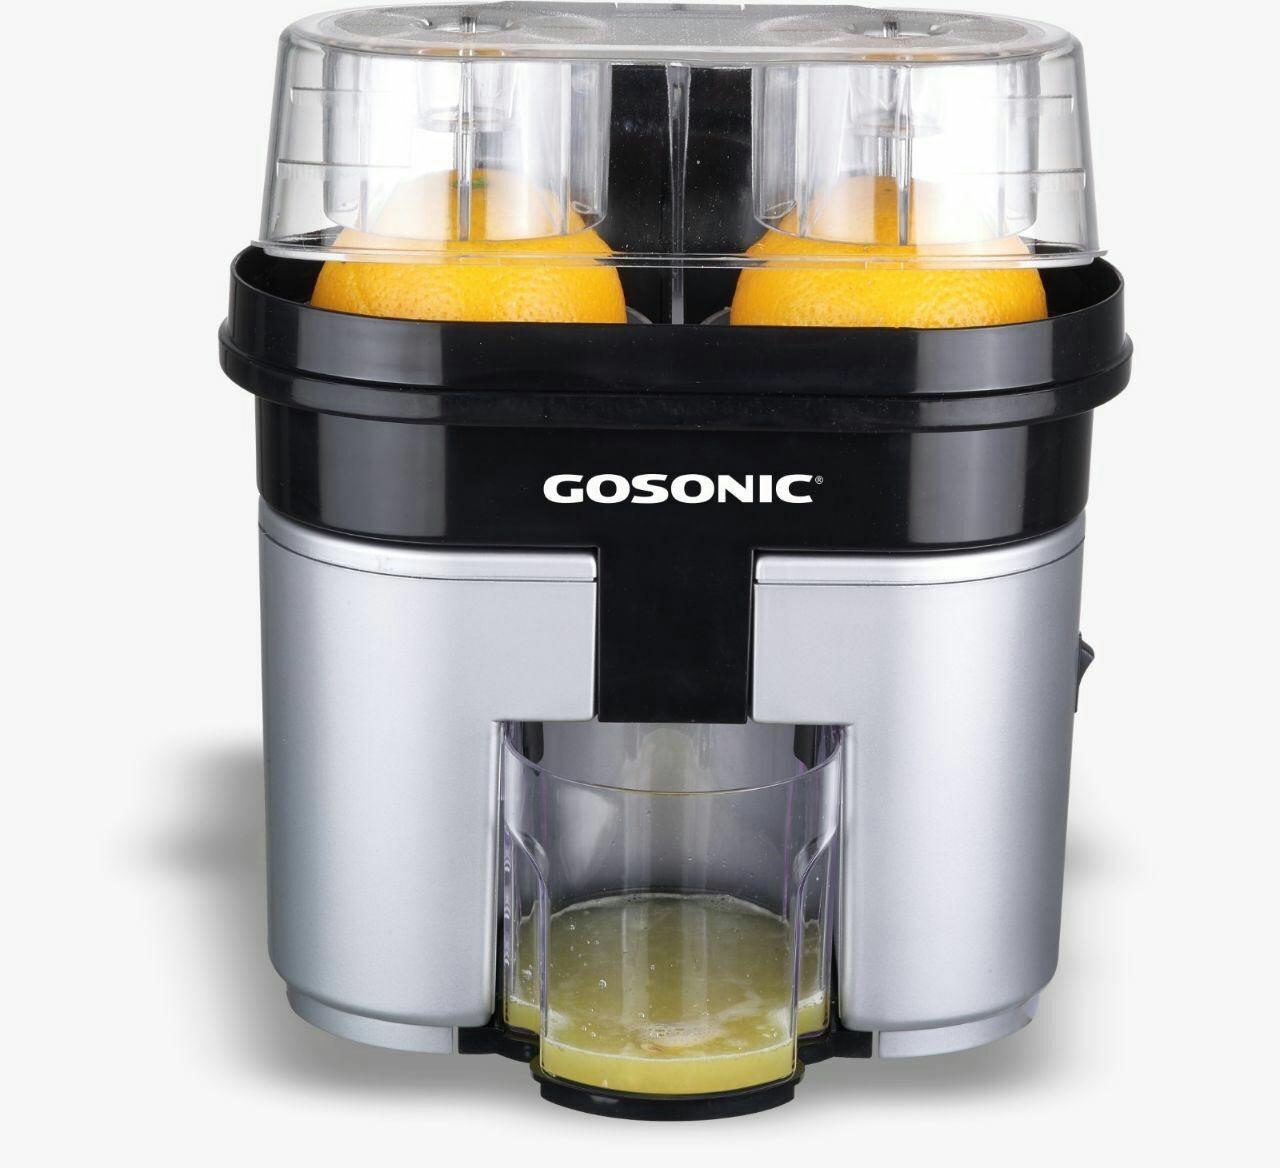 آب مرکبات گیر دوقلو  گاسونیک GCJ-406